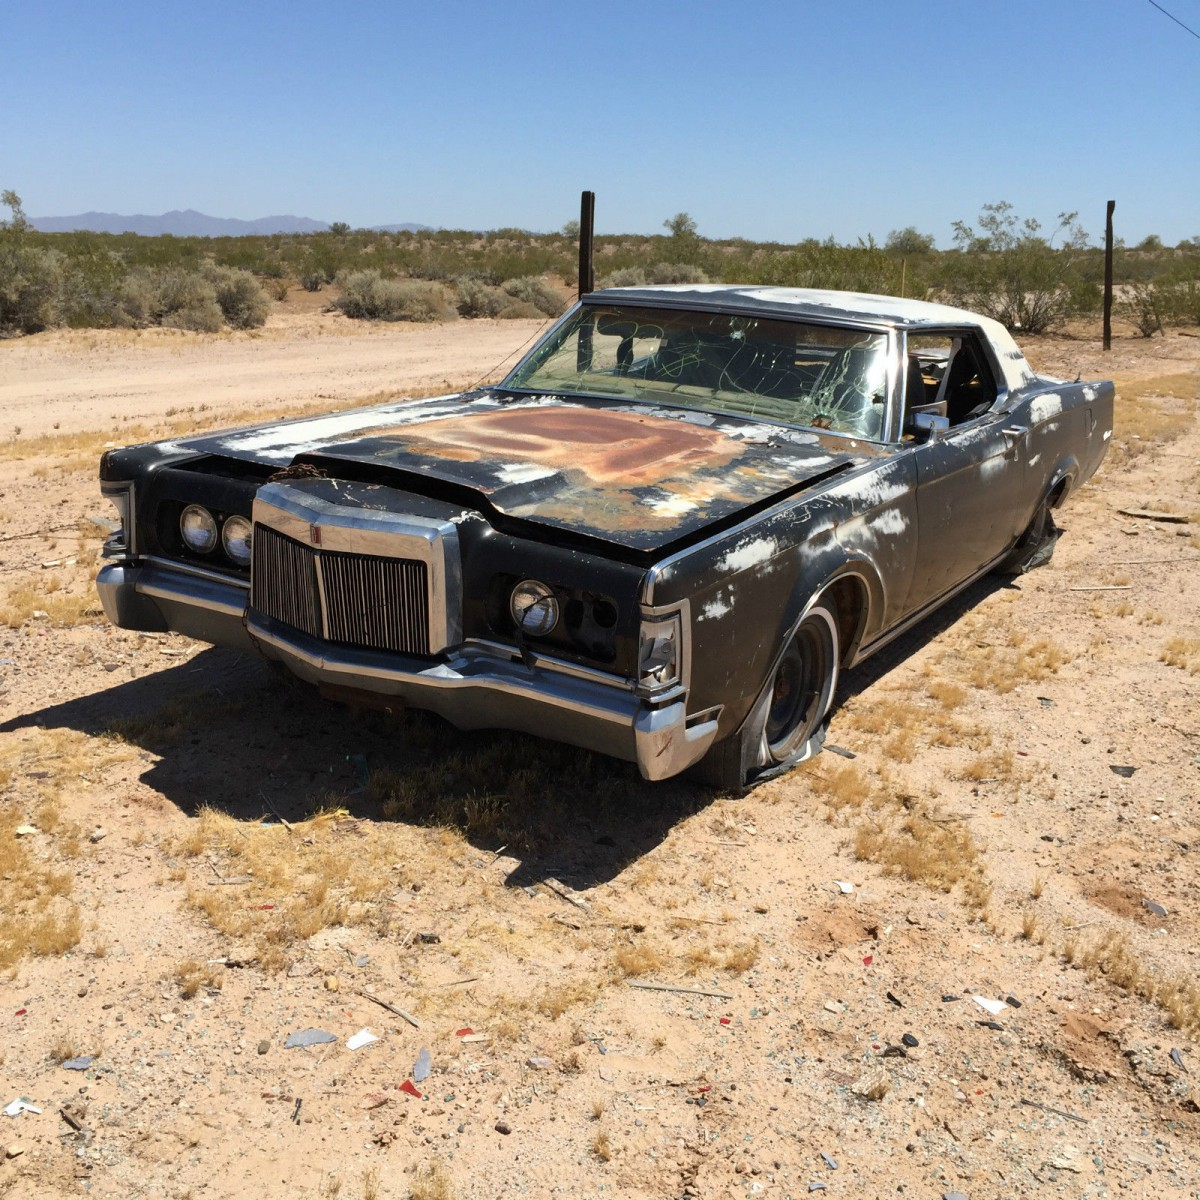 Craigslist Art: 1971 Lincoln Mark III Desert – Patina